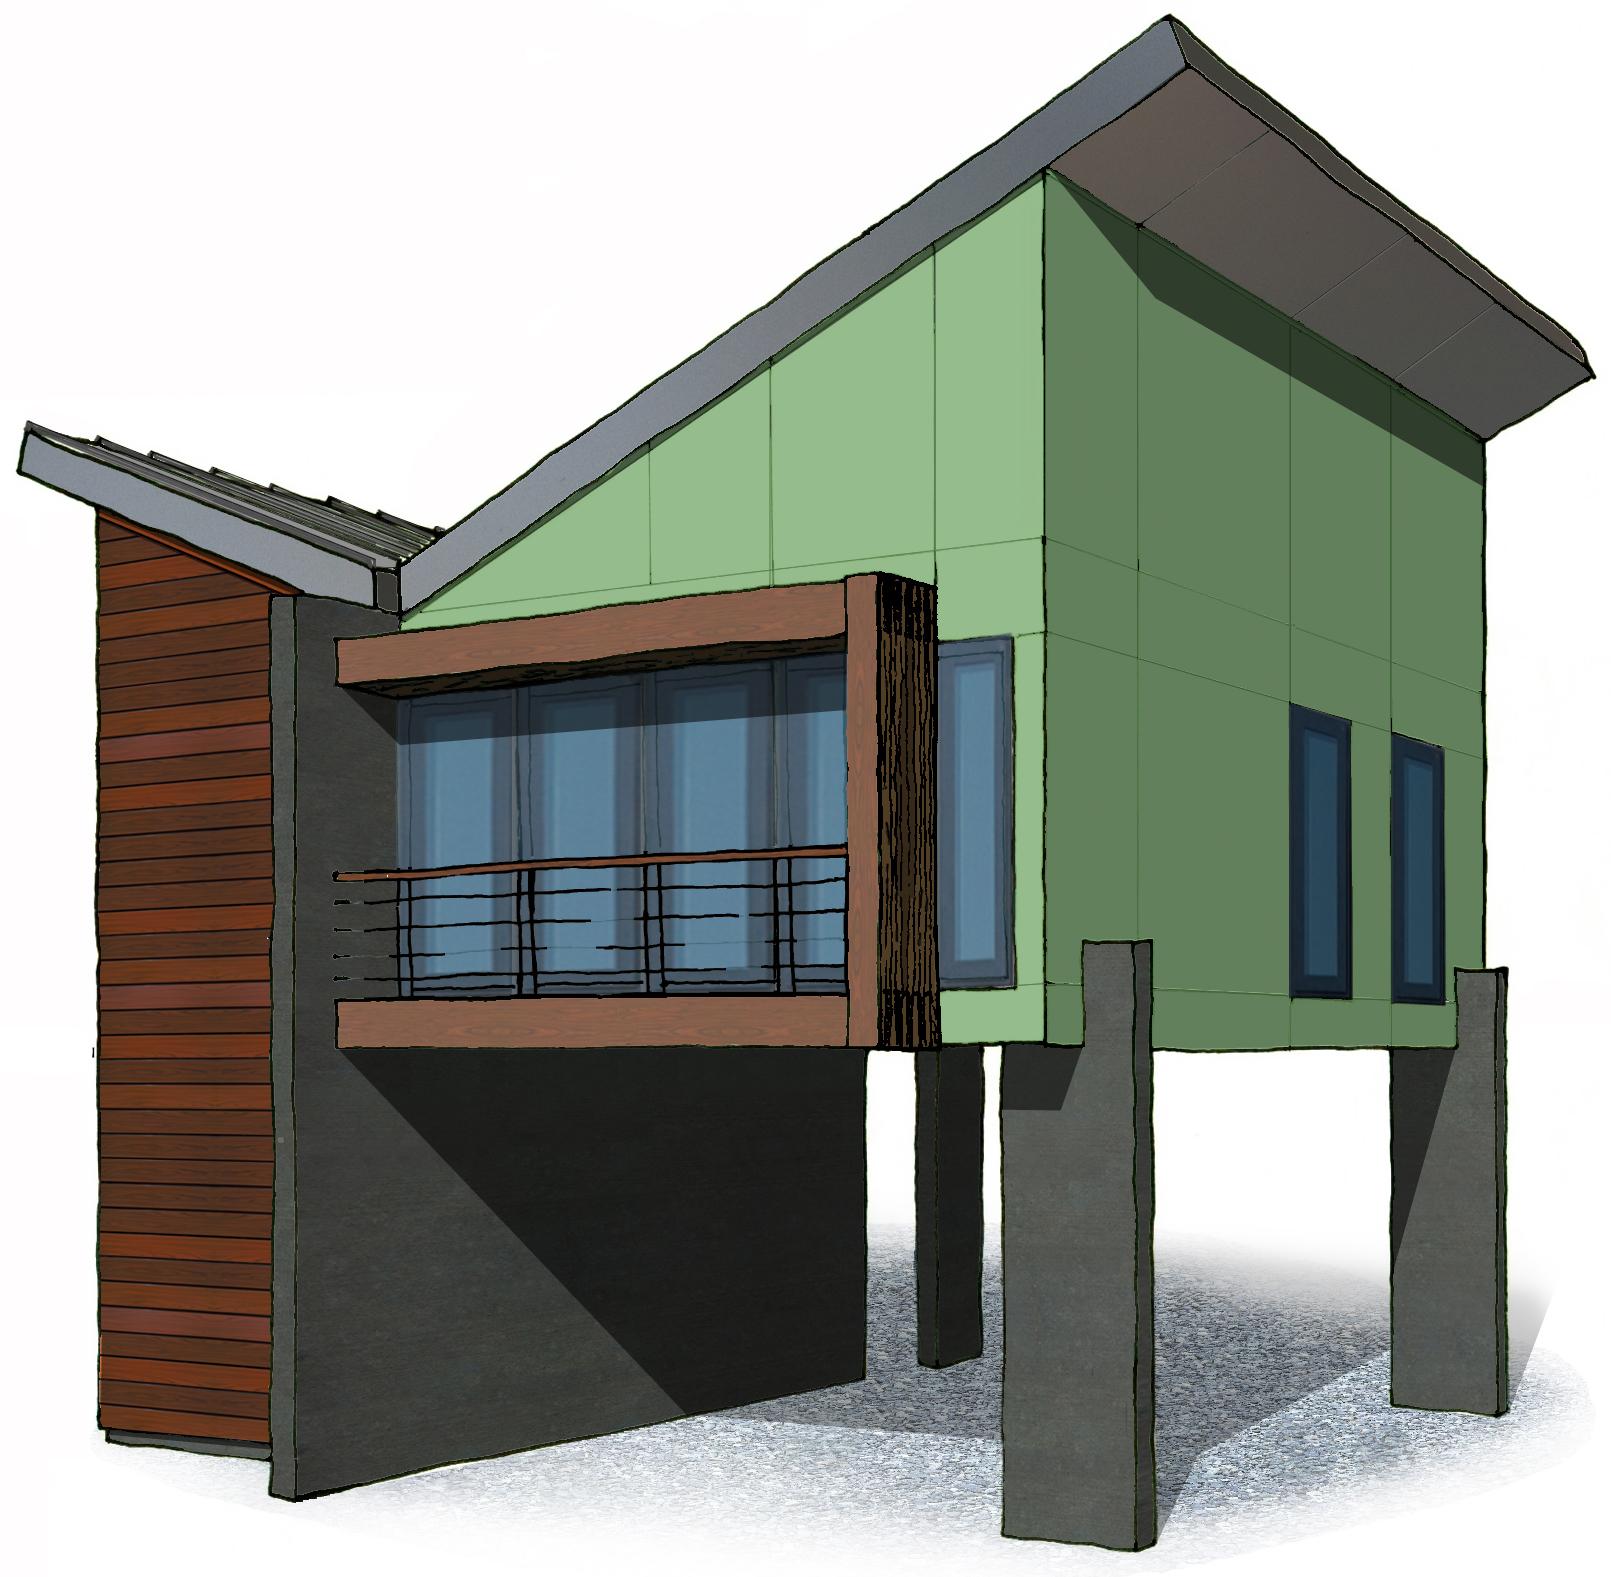 European style mdoern house home plan